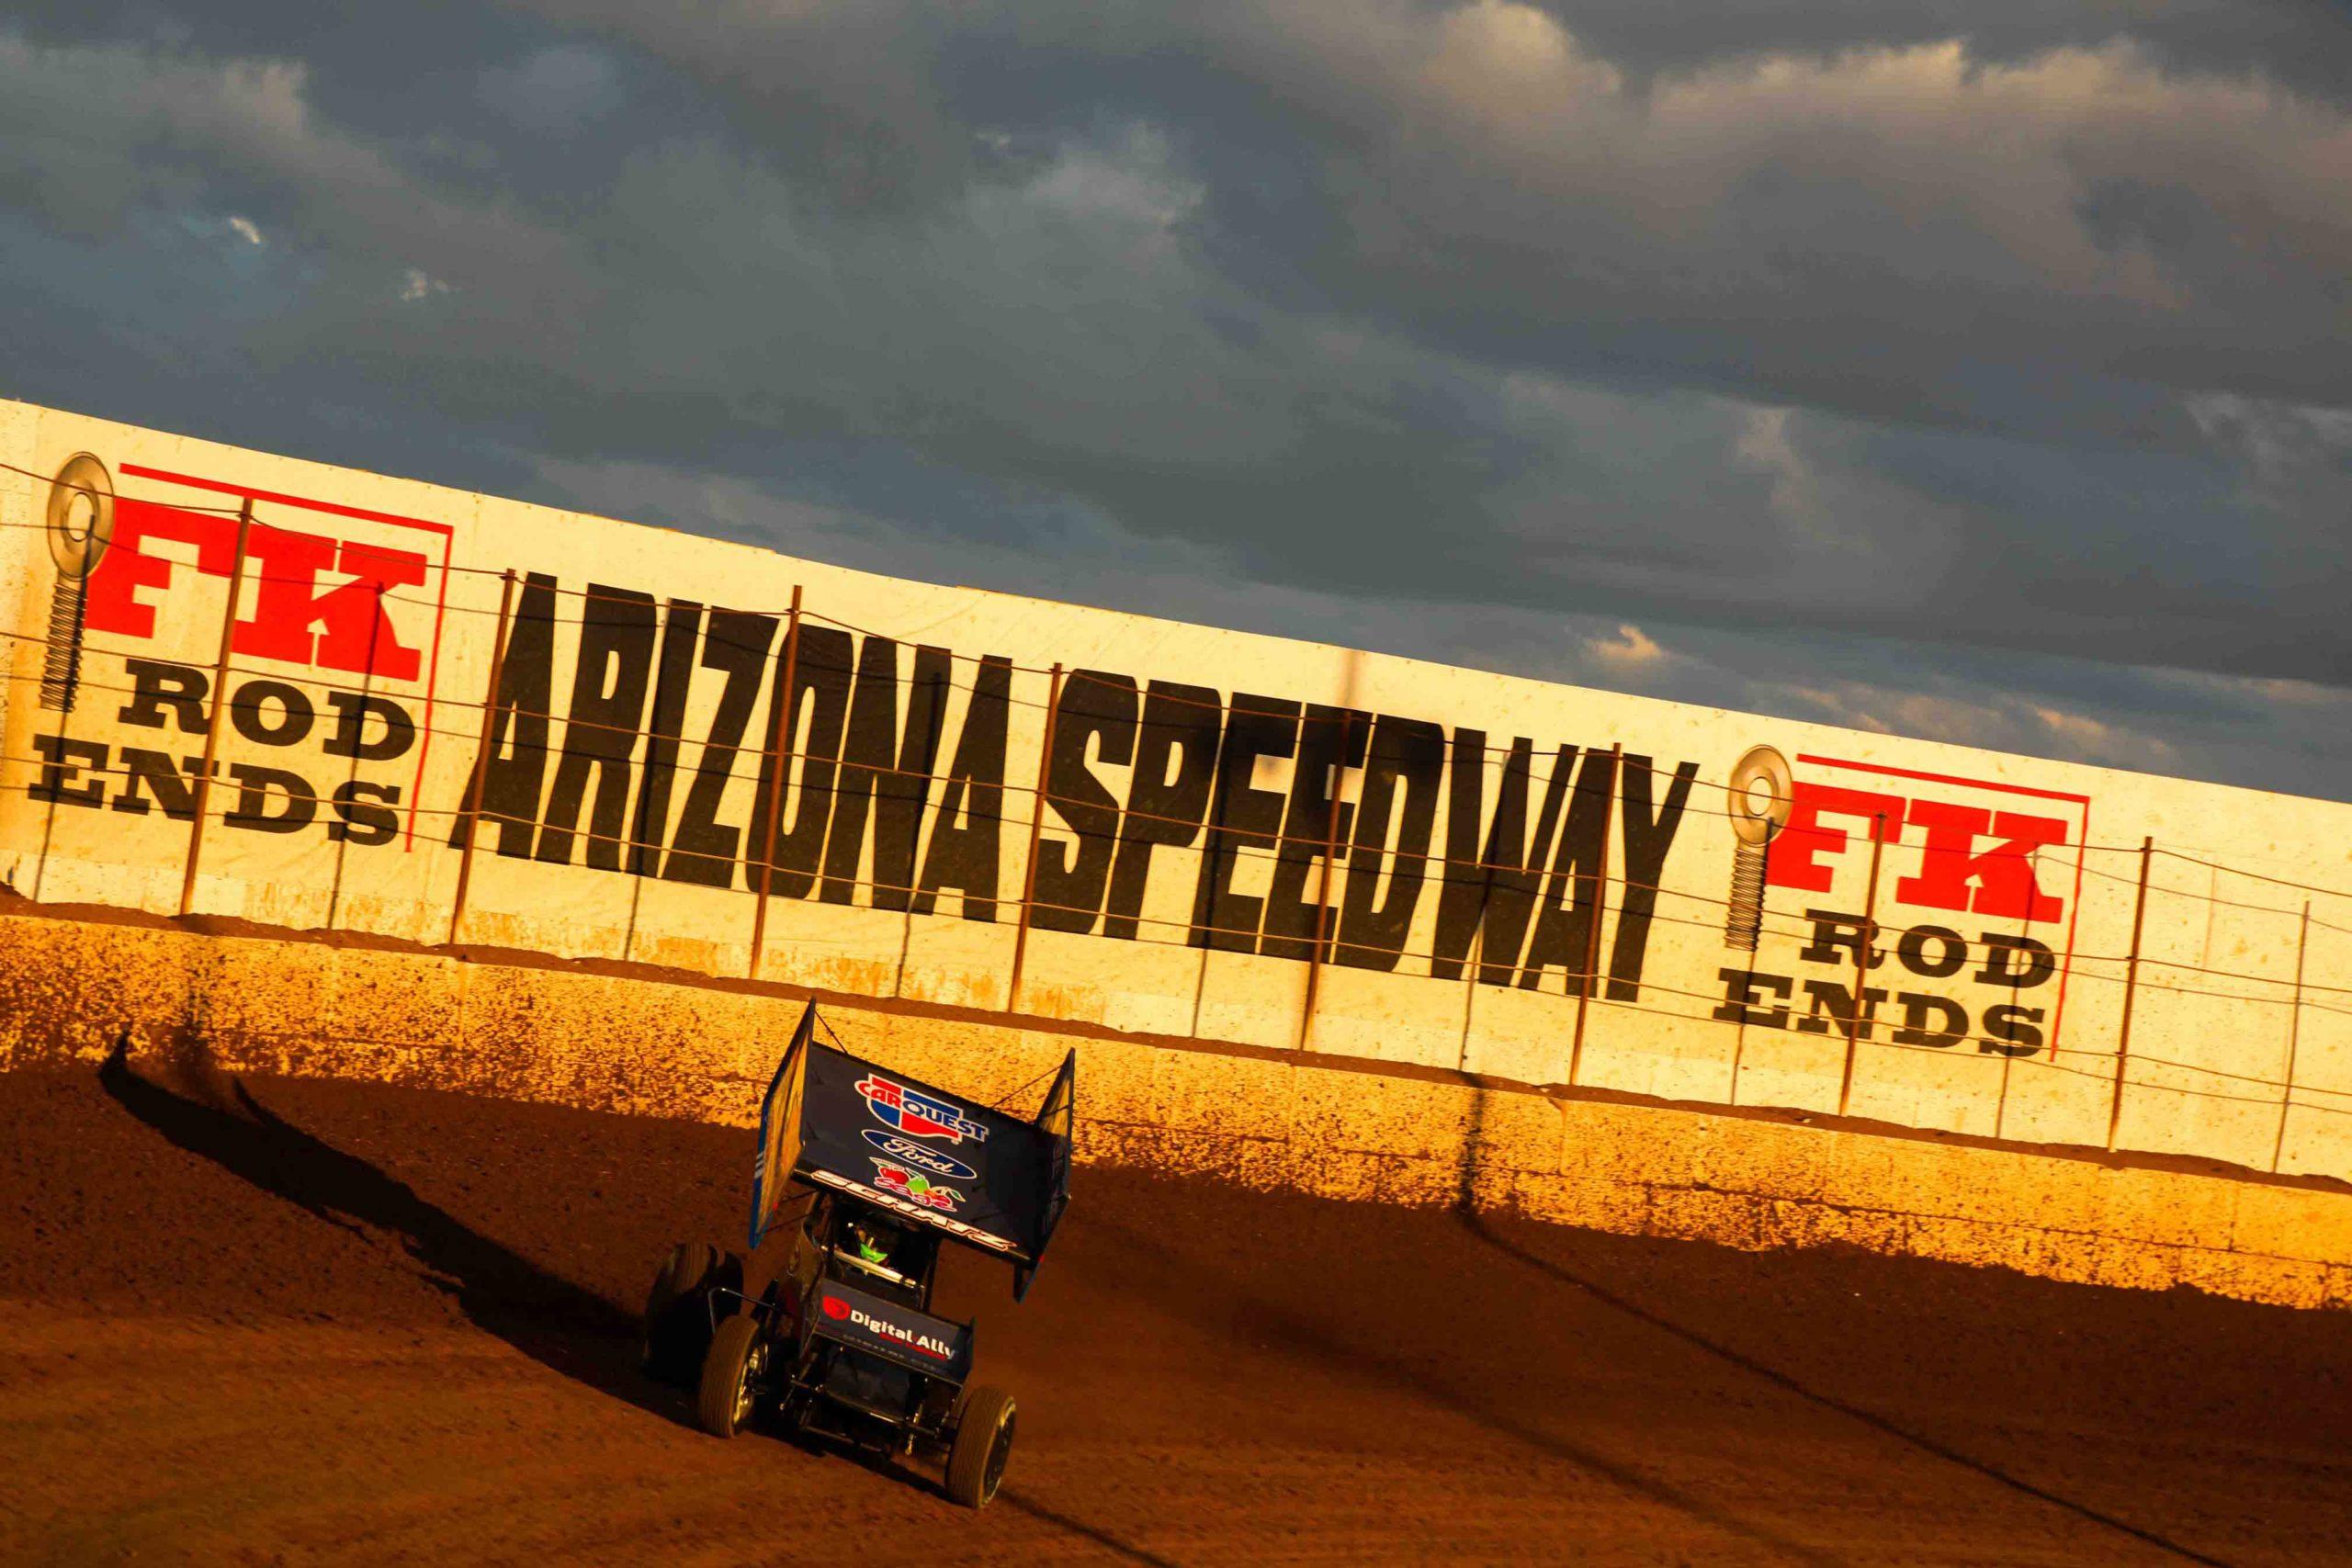 donny schatz, arizona speedway, tony stewart racing